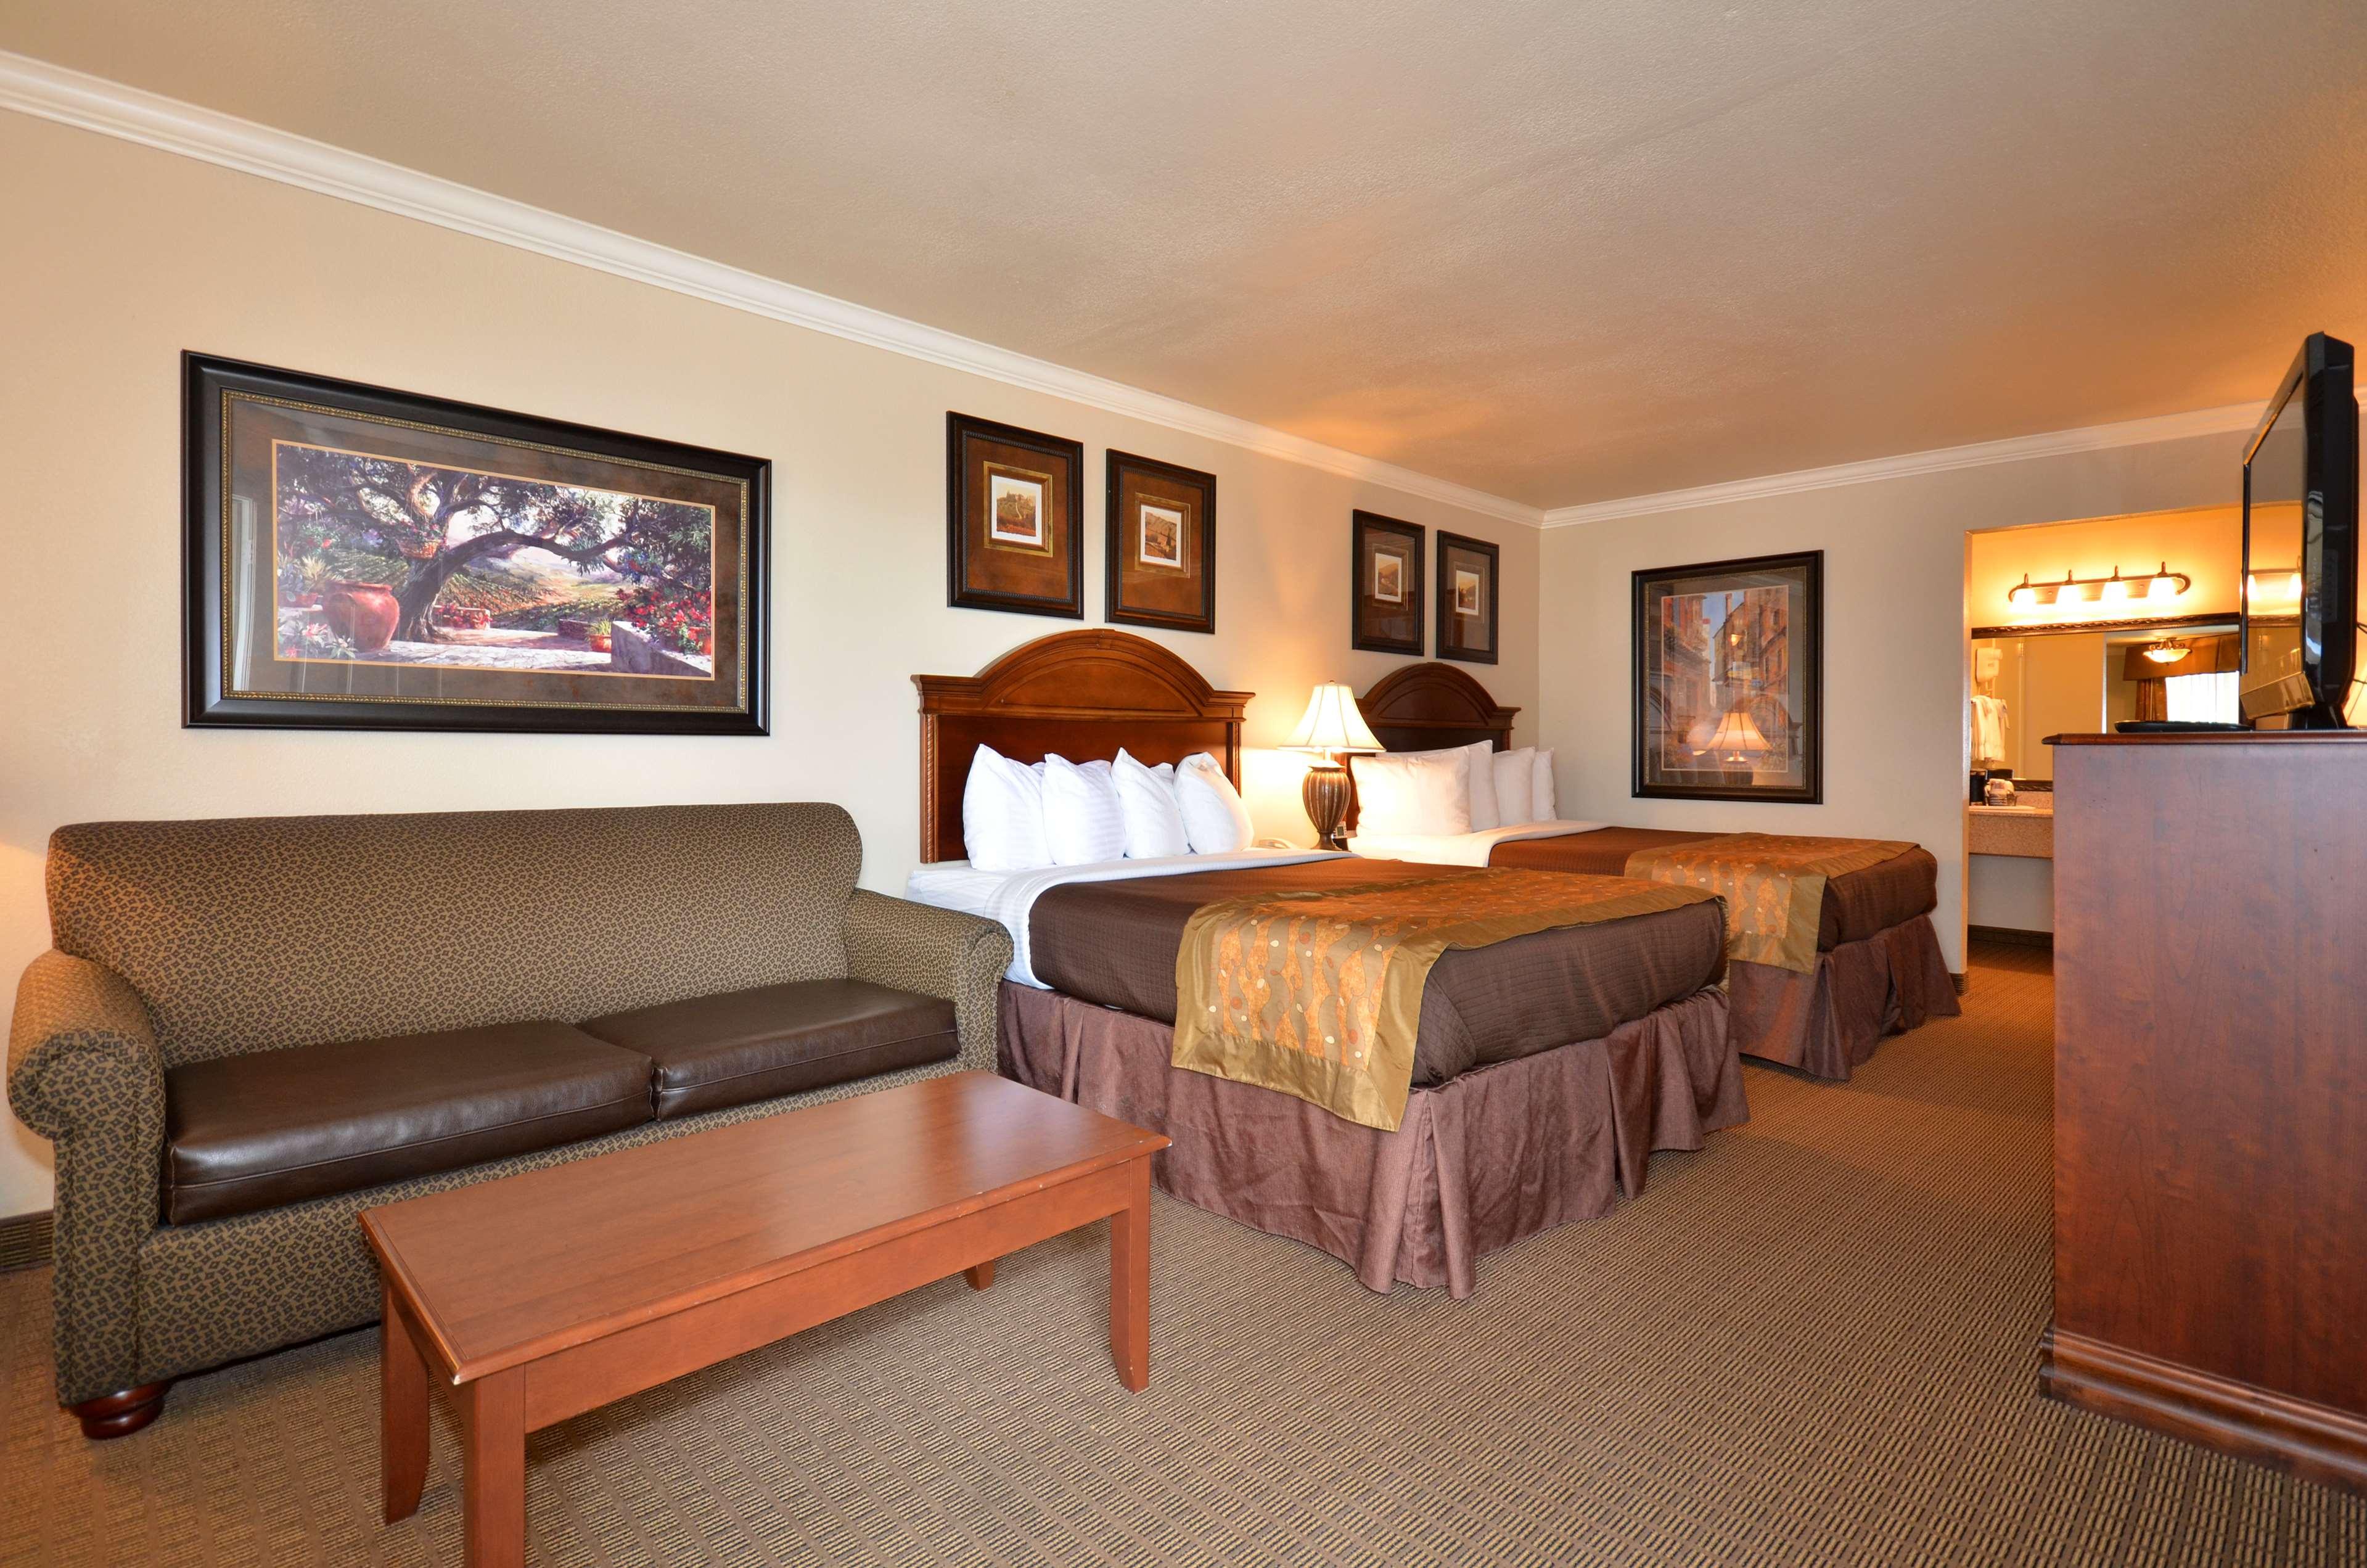 Best Western Inn of McAlester image 25